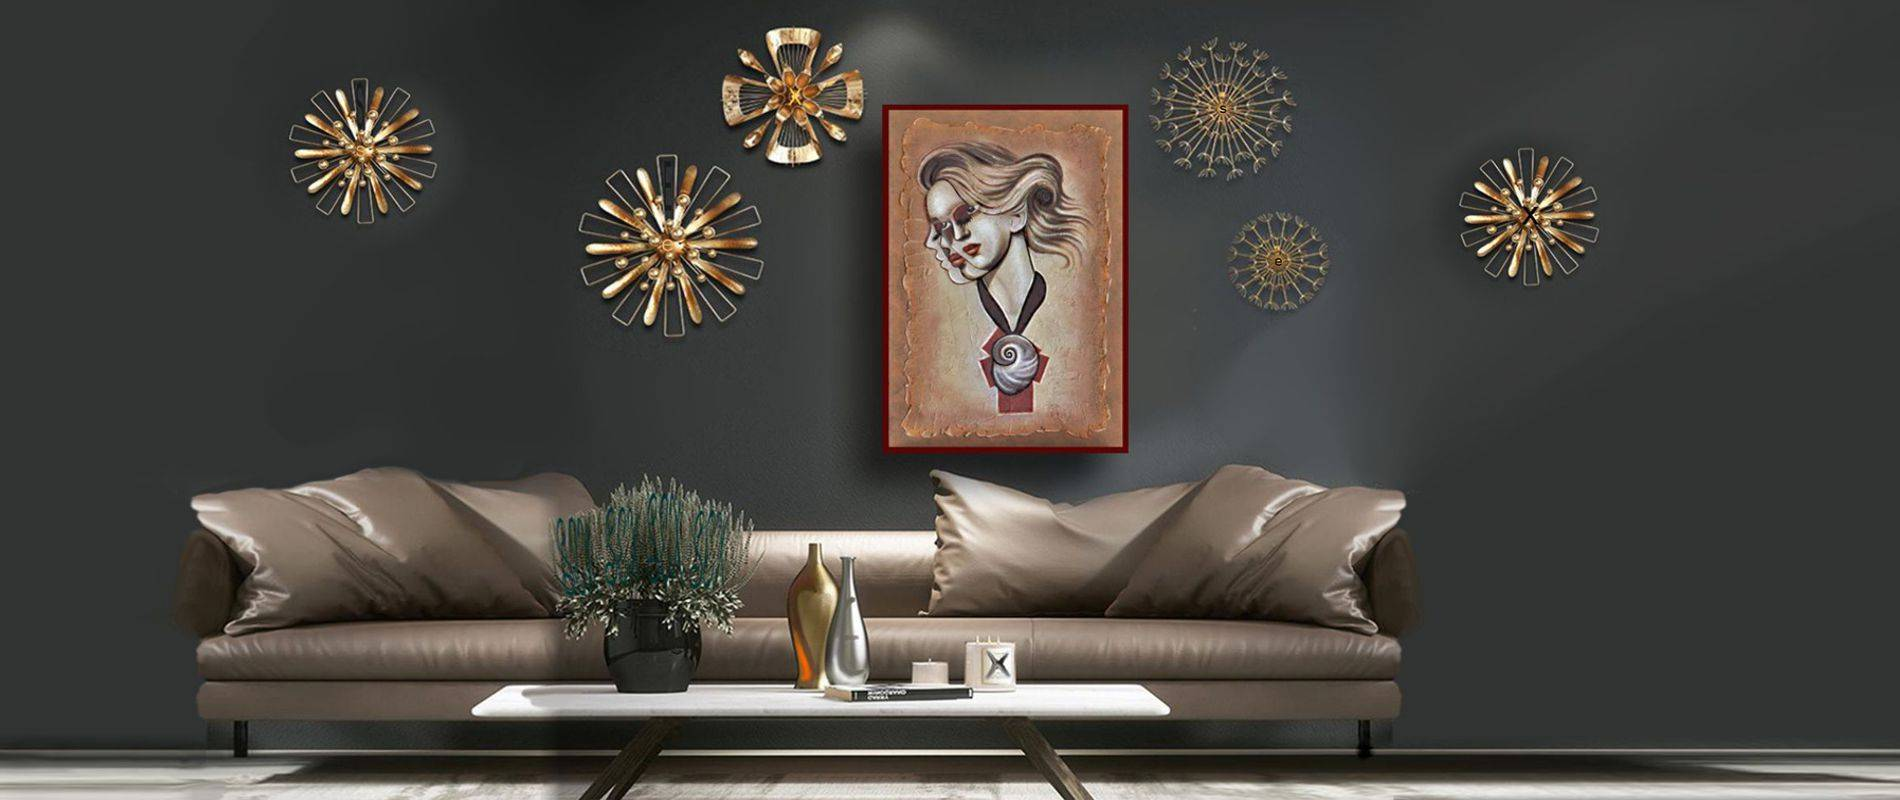 artworks paintings vincenzo greco new york miami (35)